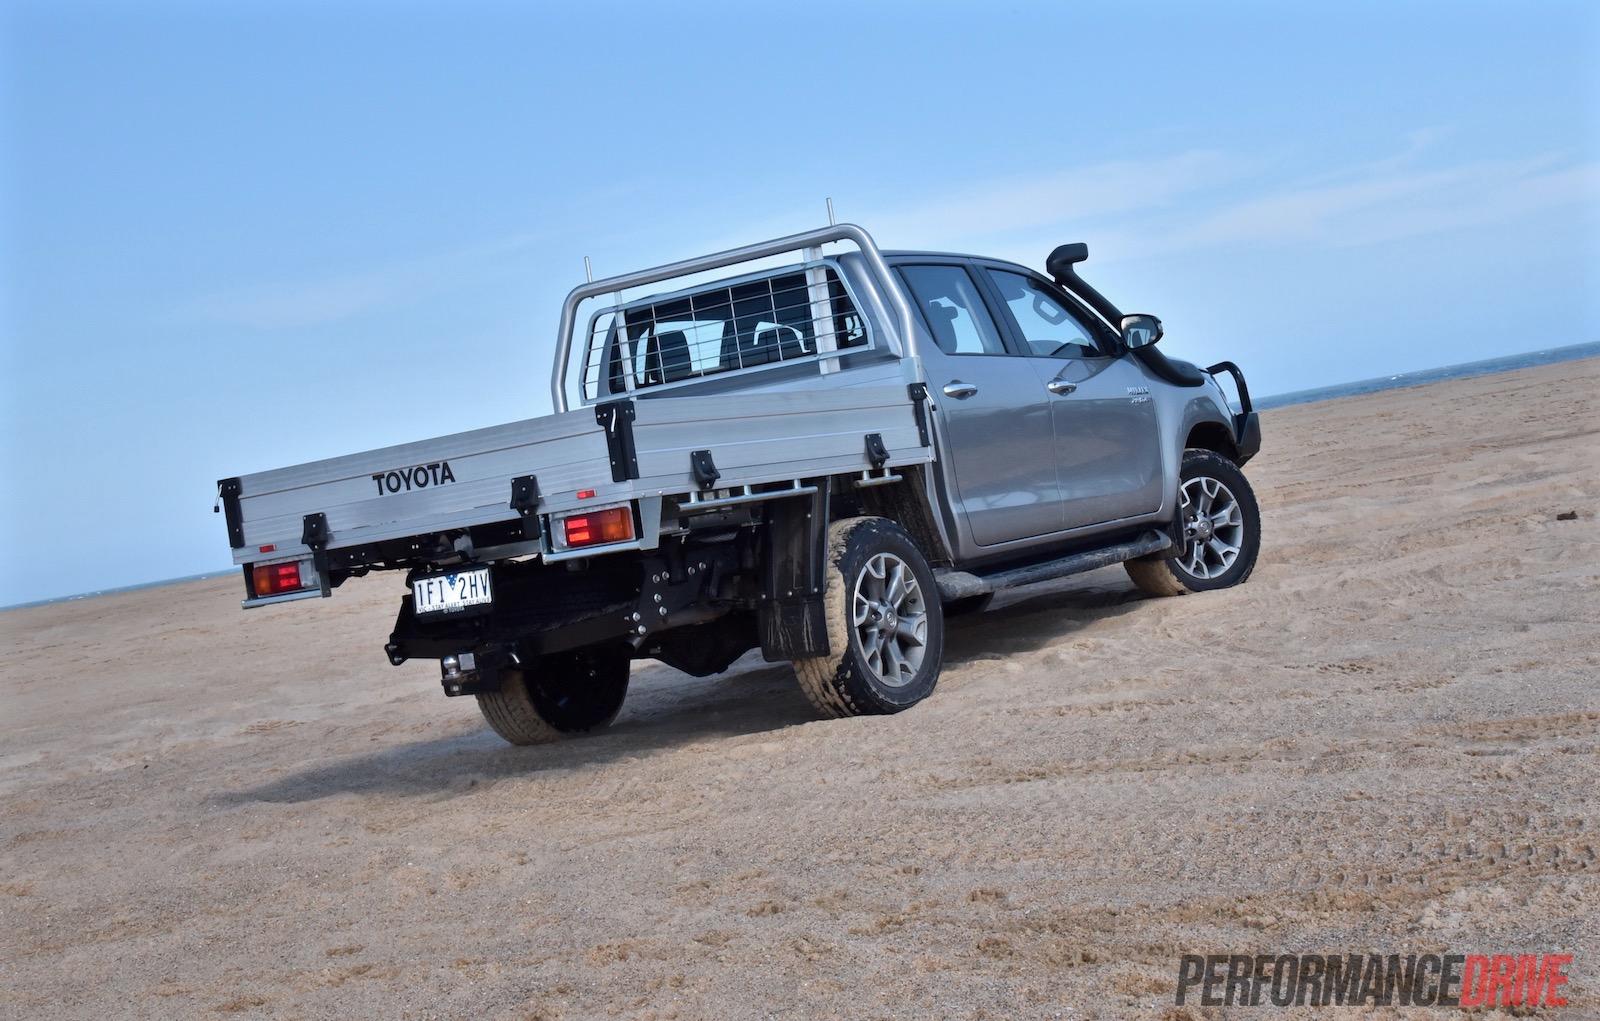 2016 Toyota Hilux 2 8 Td Review Video Performancedrive